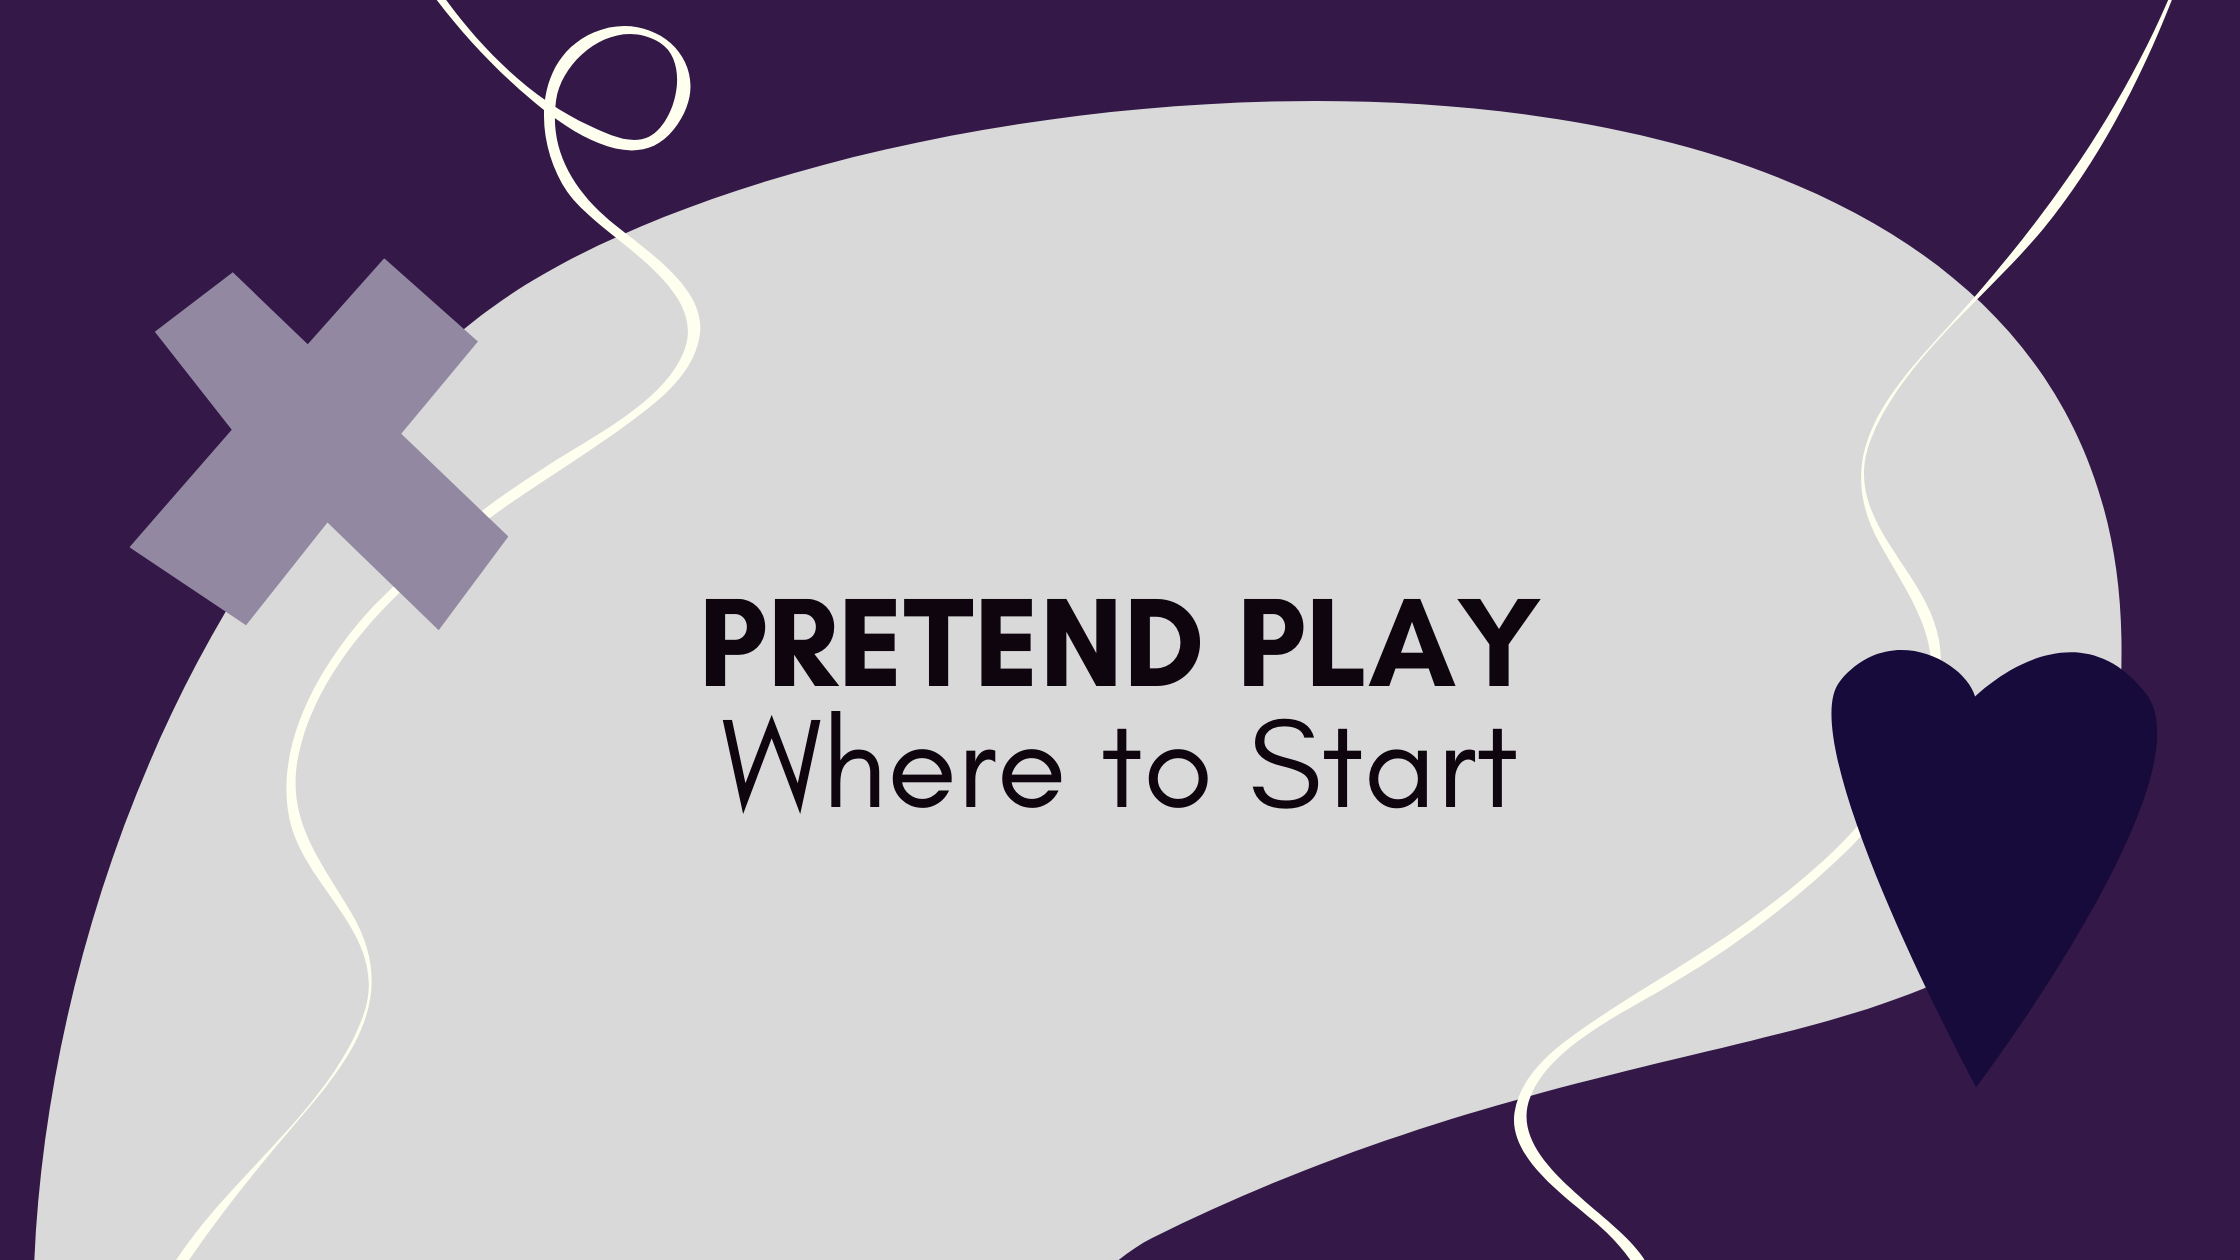 Pretend Play - Where to Start